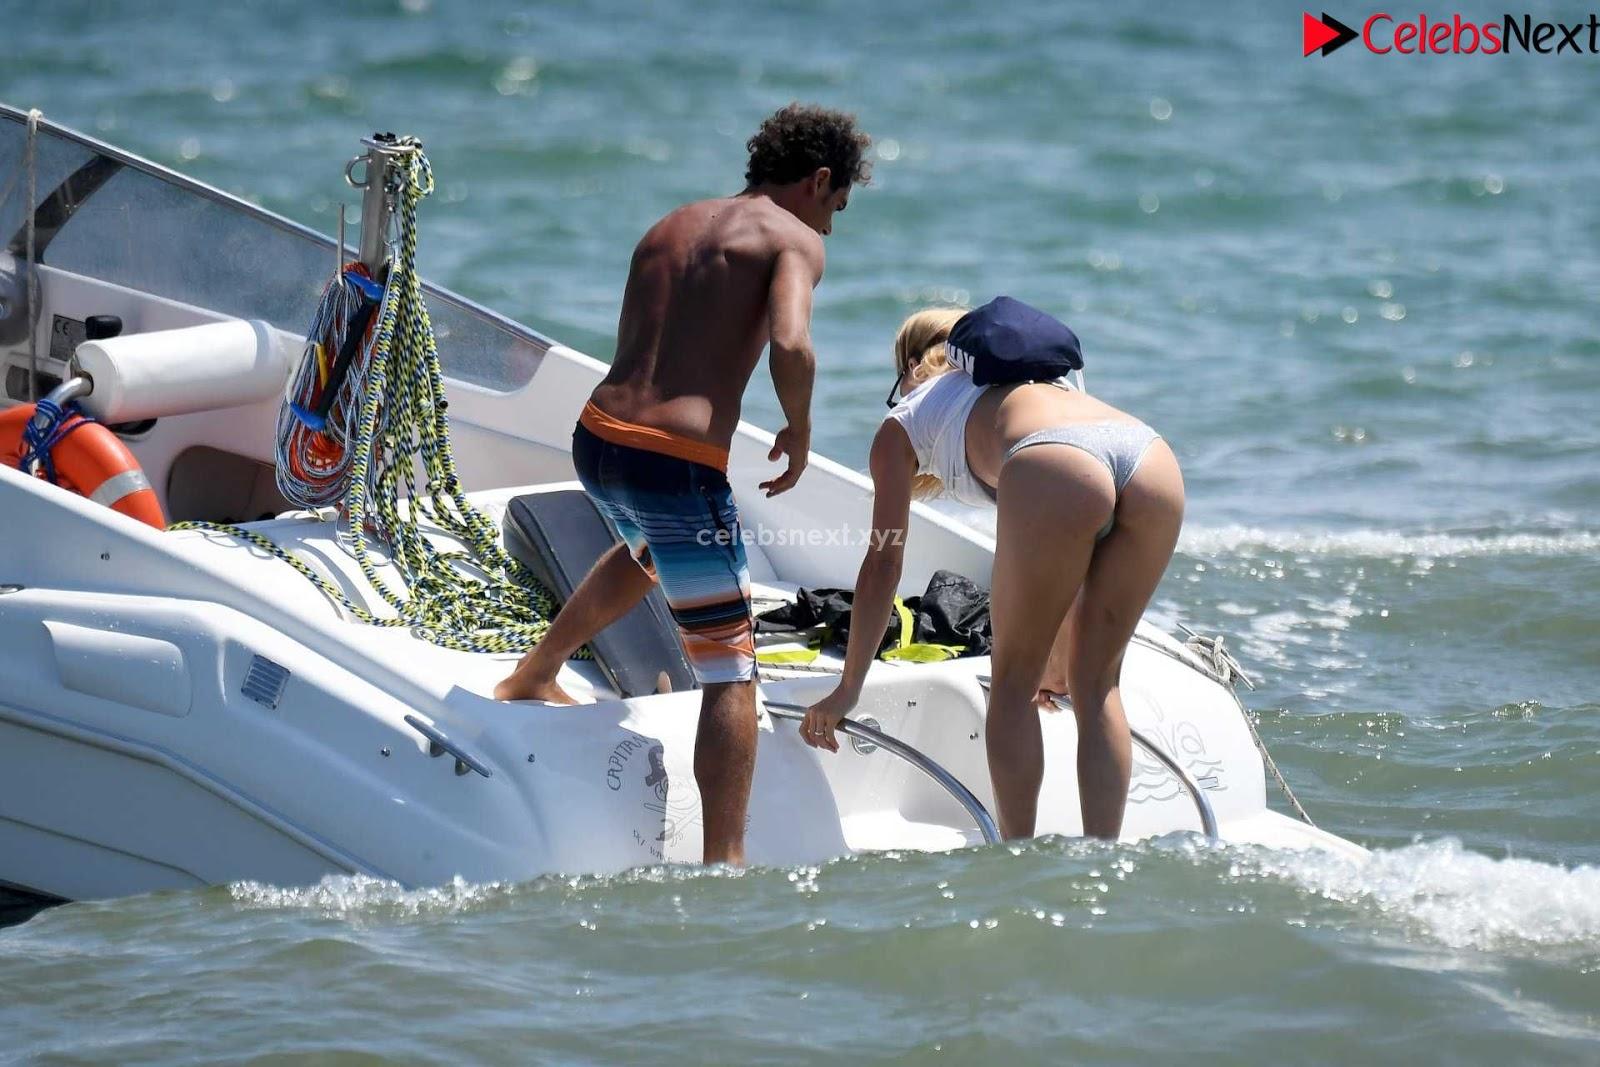 Michelle Hunziker Beautiful Booty ass Butts Boobs in Bikin July 2018 ~ CelebrityBooty.co Exclusive Celebrity Pics